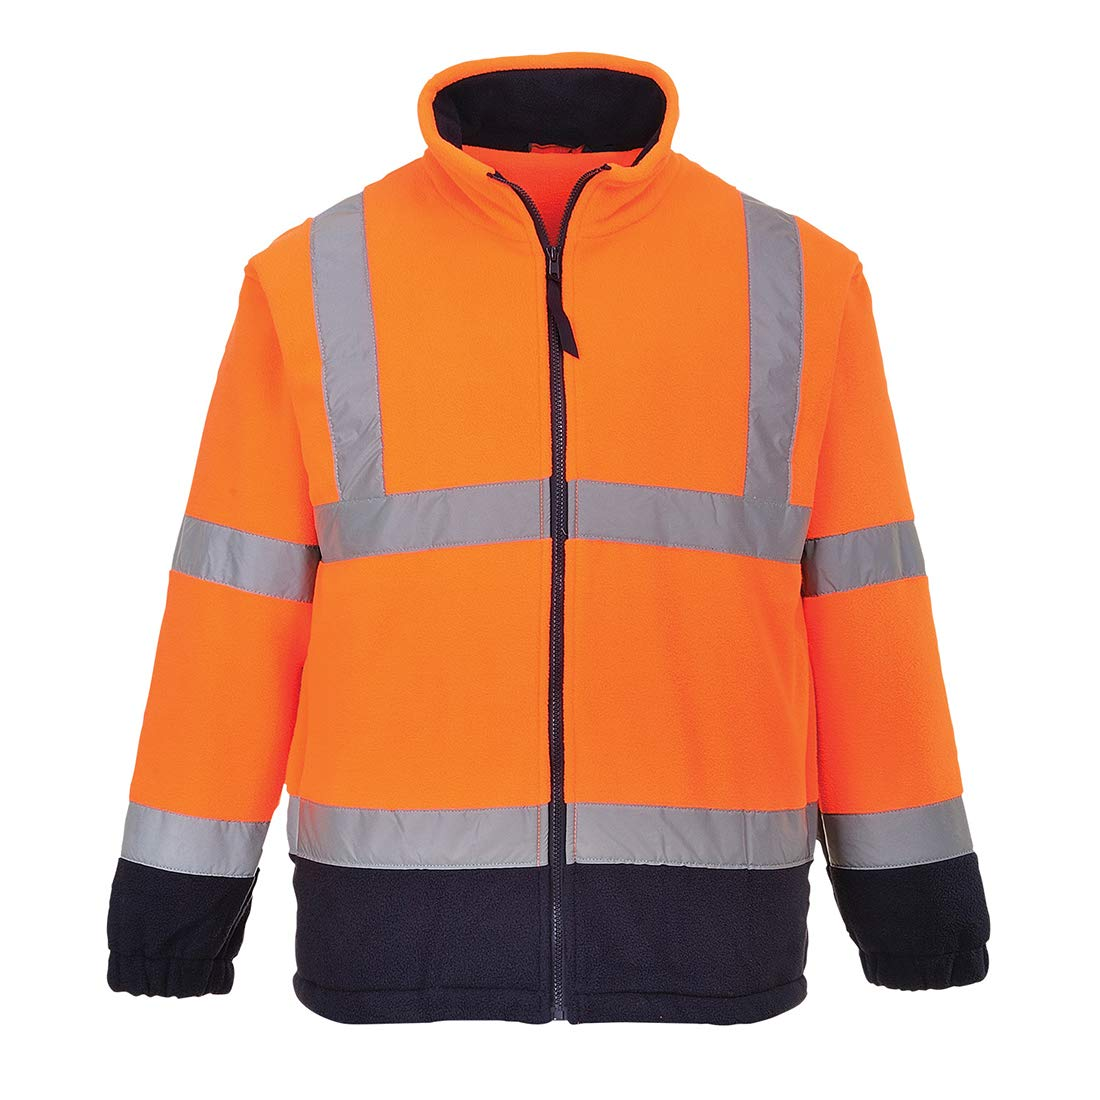 XX-Large Portwest F301ONRXXL Hi-Vis Two Tone Fleece Orange Regular